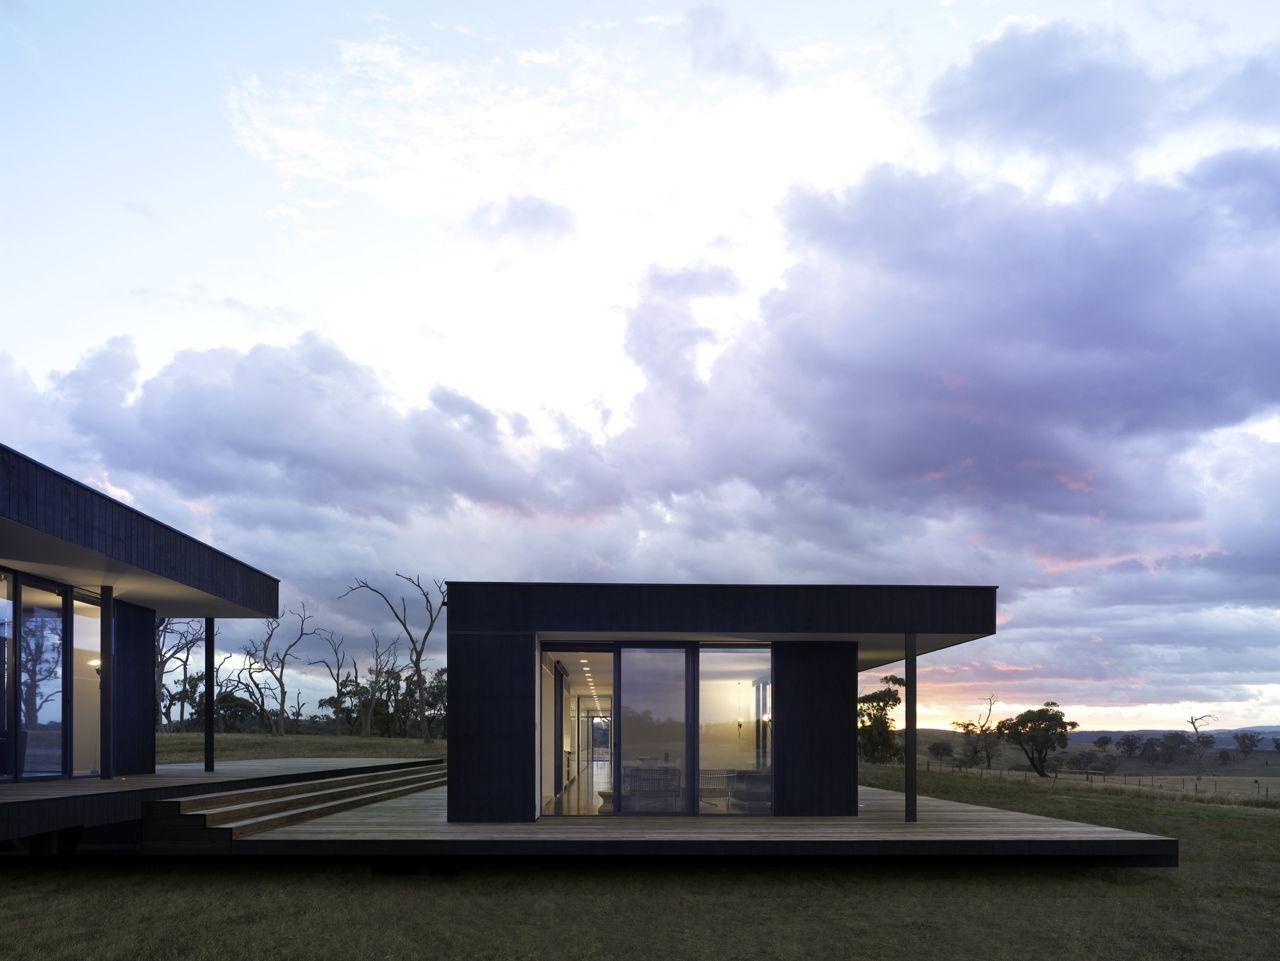 Gallery Of Kilmore House Intermode Pty Ltd 2 Country House Design Modern Prefab Homes Prefabricated Houses